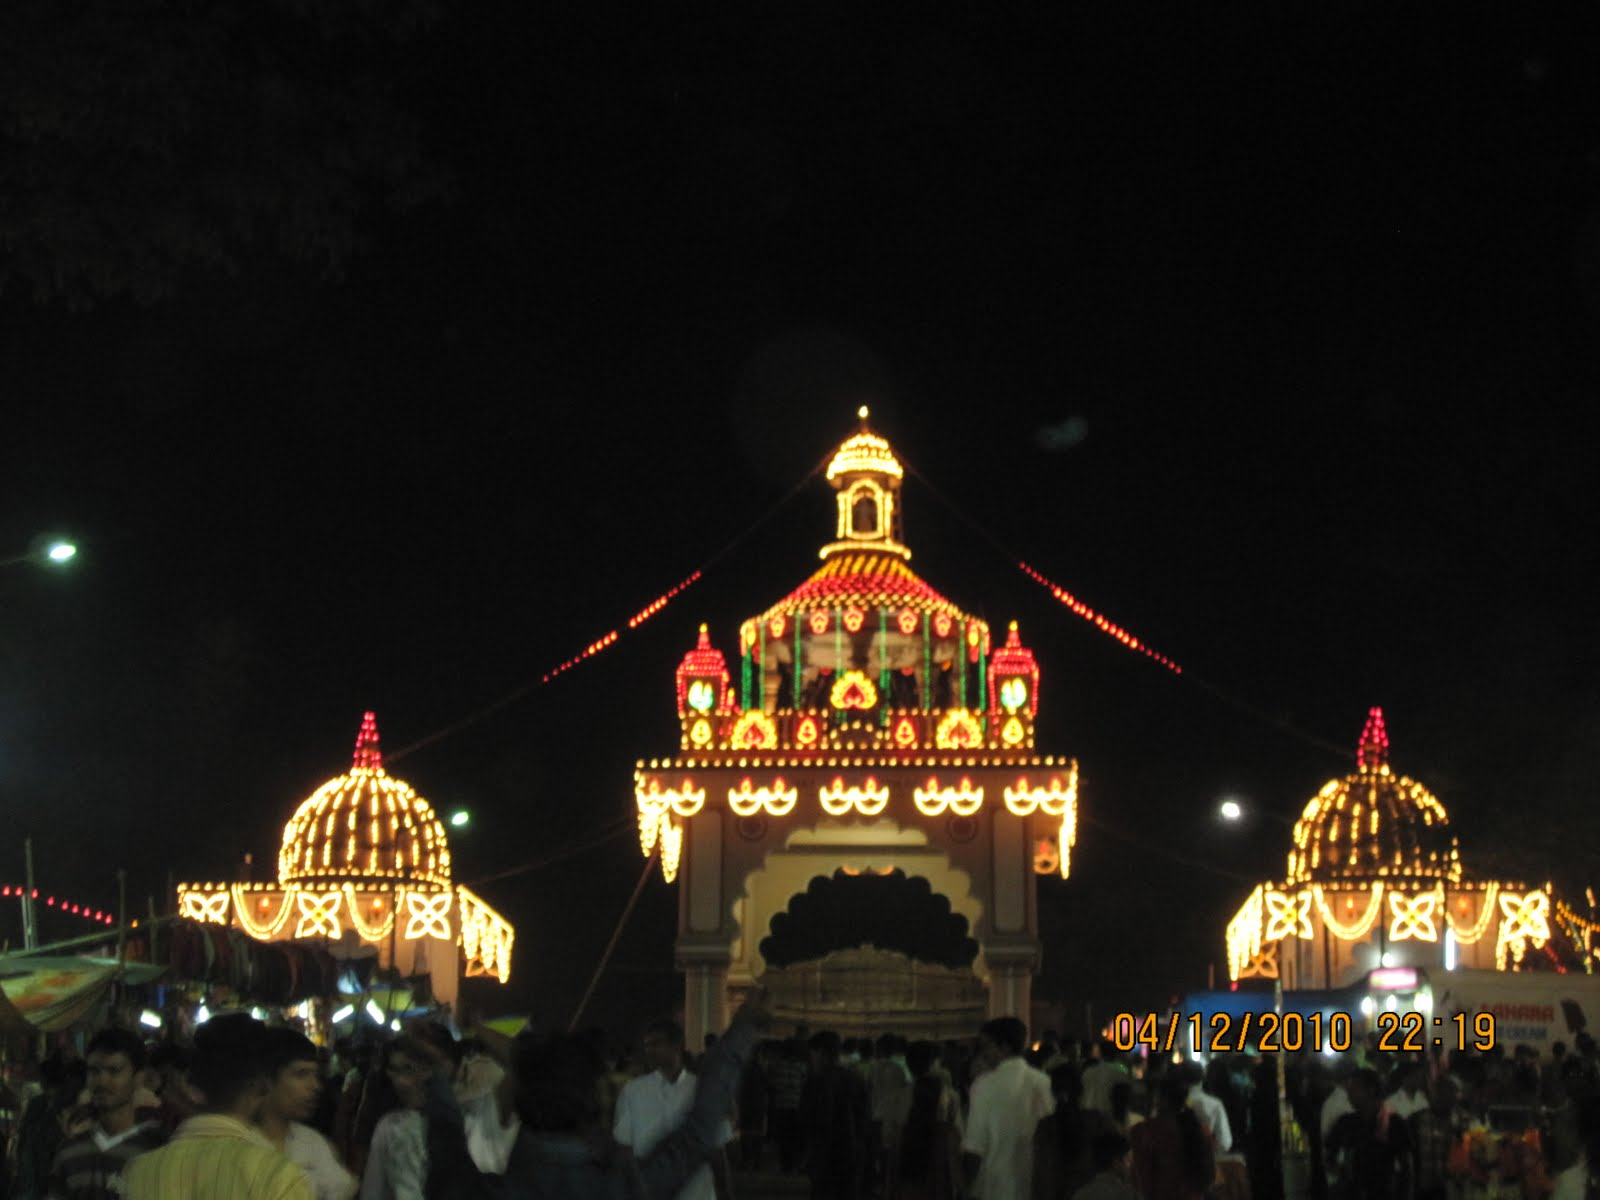 Shri Dharmasthala Manjunatheshwara Swamy Temple, Karnataka